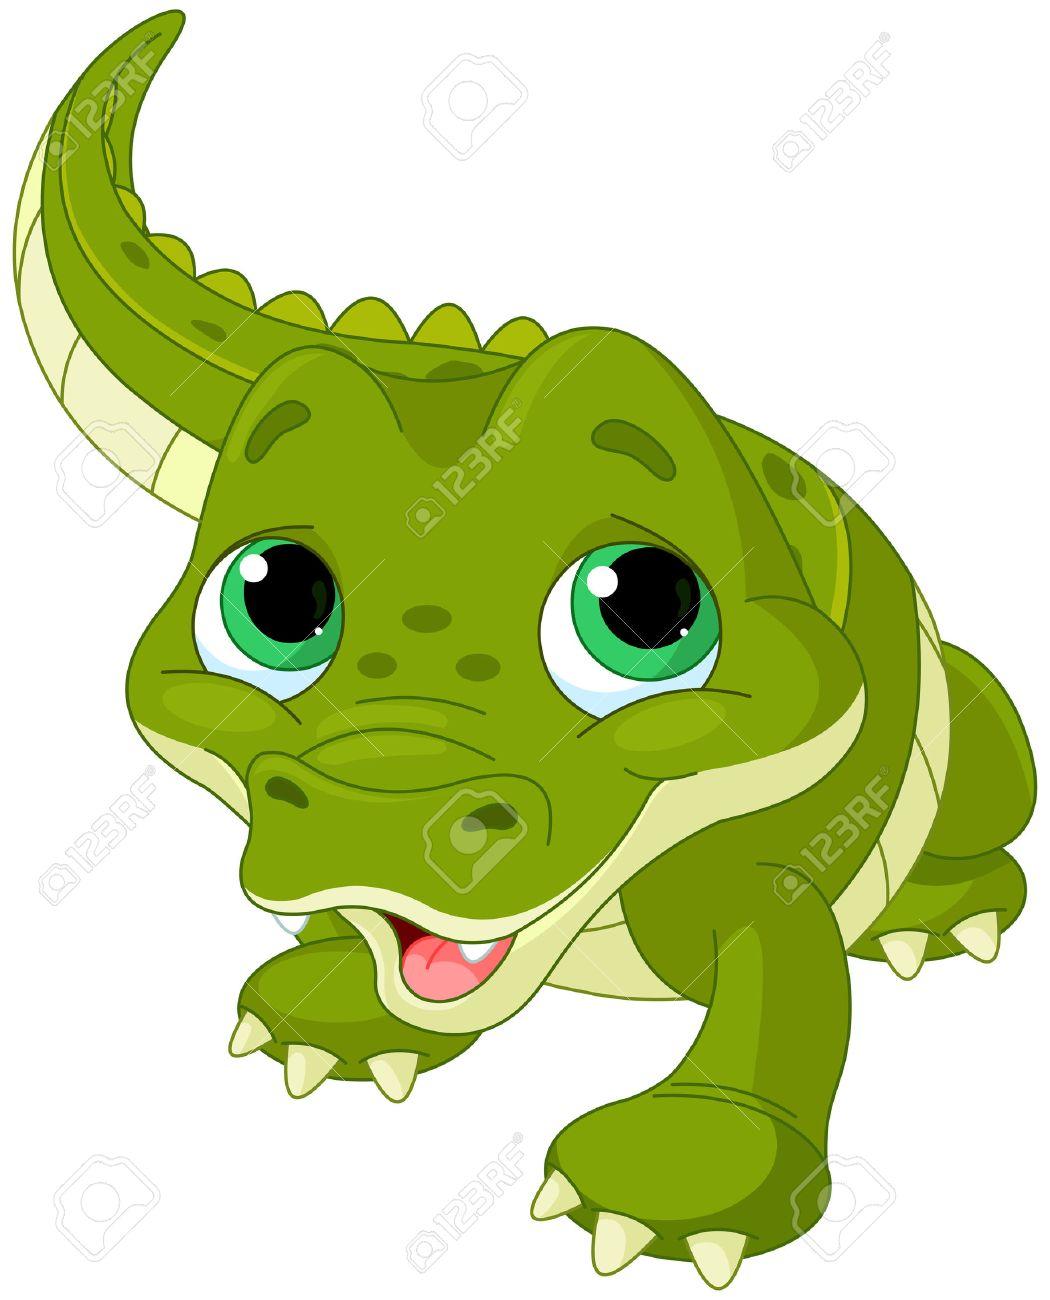 Illustration of very cute baby alligator.